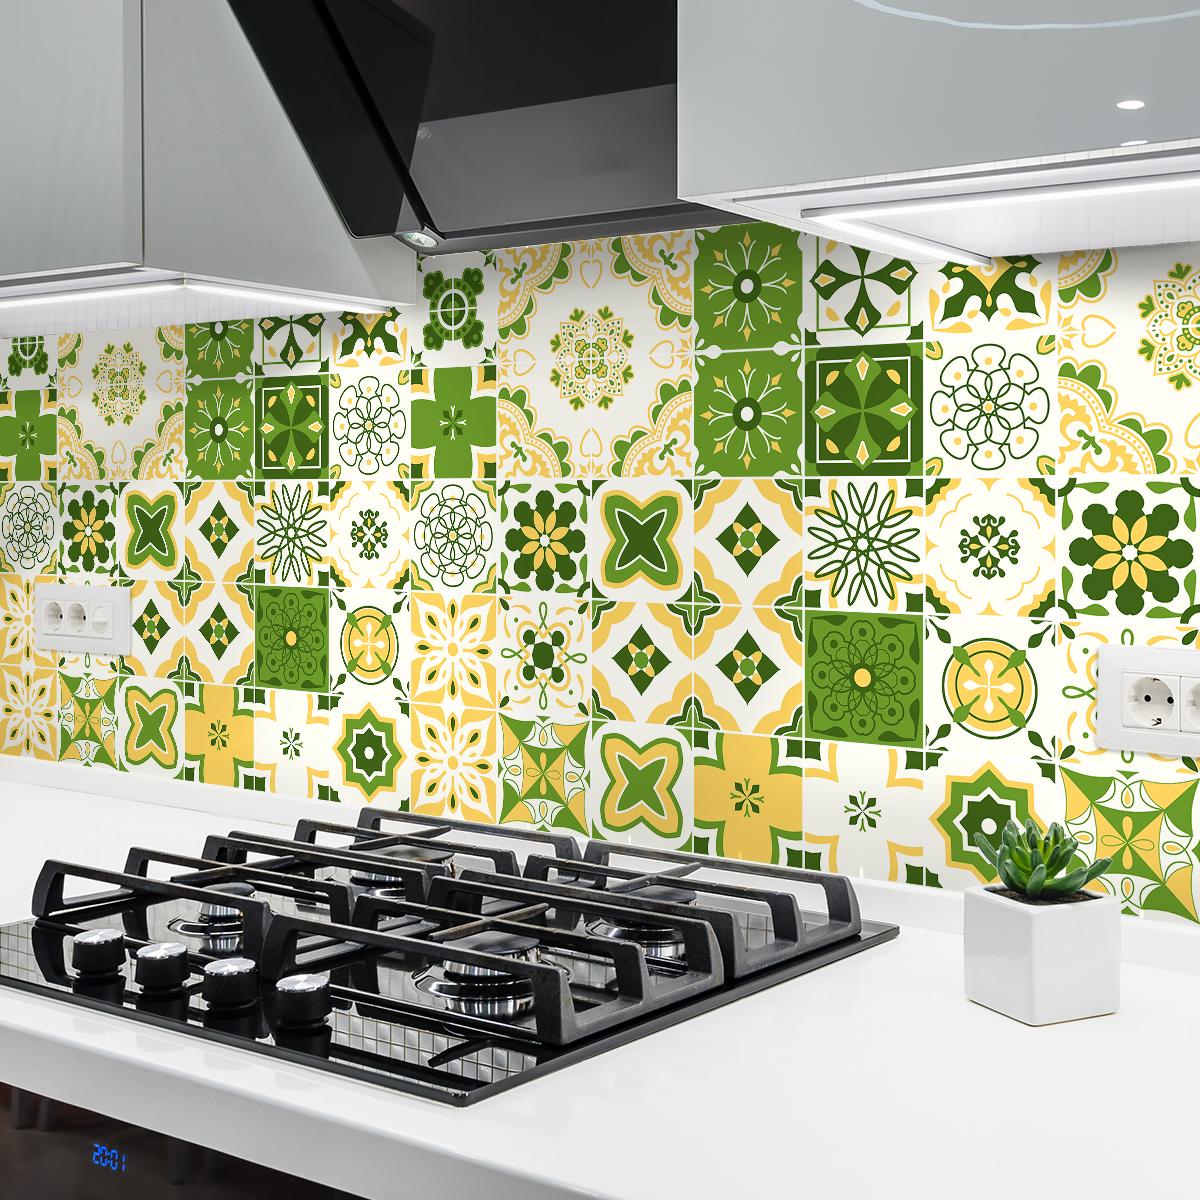 9 stickers carreaux de ciment azulejos prisca cuisine. Black Bedroom Furniture Sets. Home Design Ideas